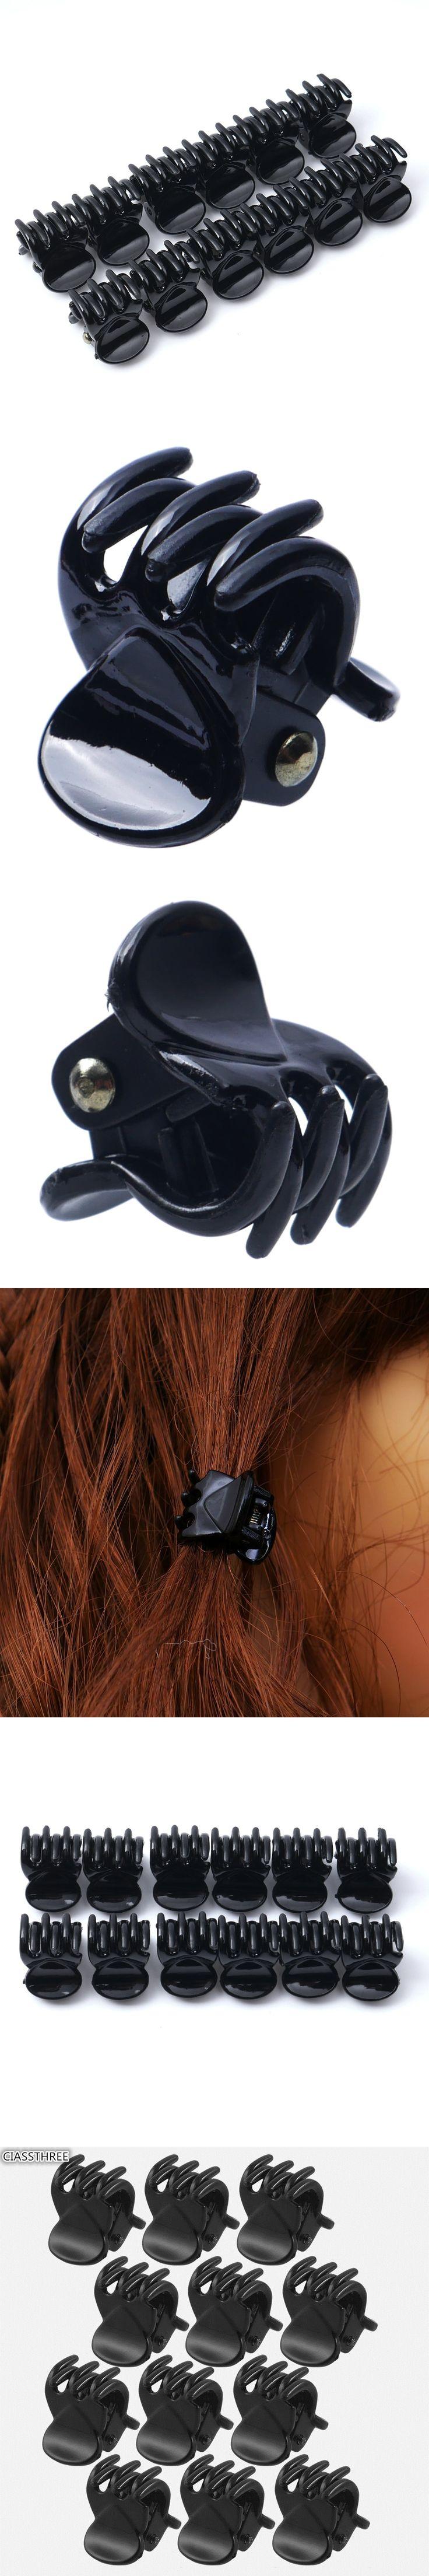 12 pcs/sets Fashion Popular Women crab Hair claw clip Girls Black Plastic Mini Hairpin Claws Hair Clip Clamp For Women Gifts